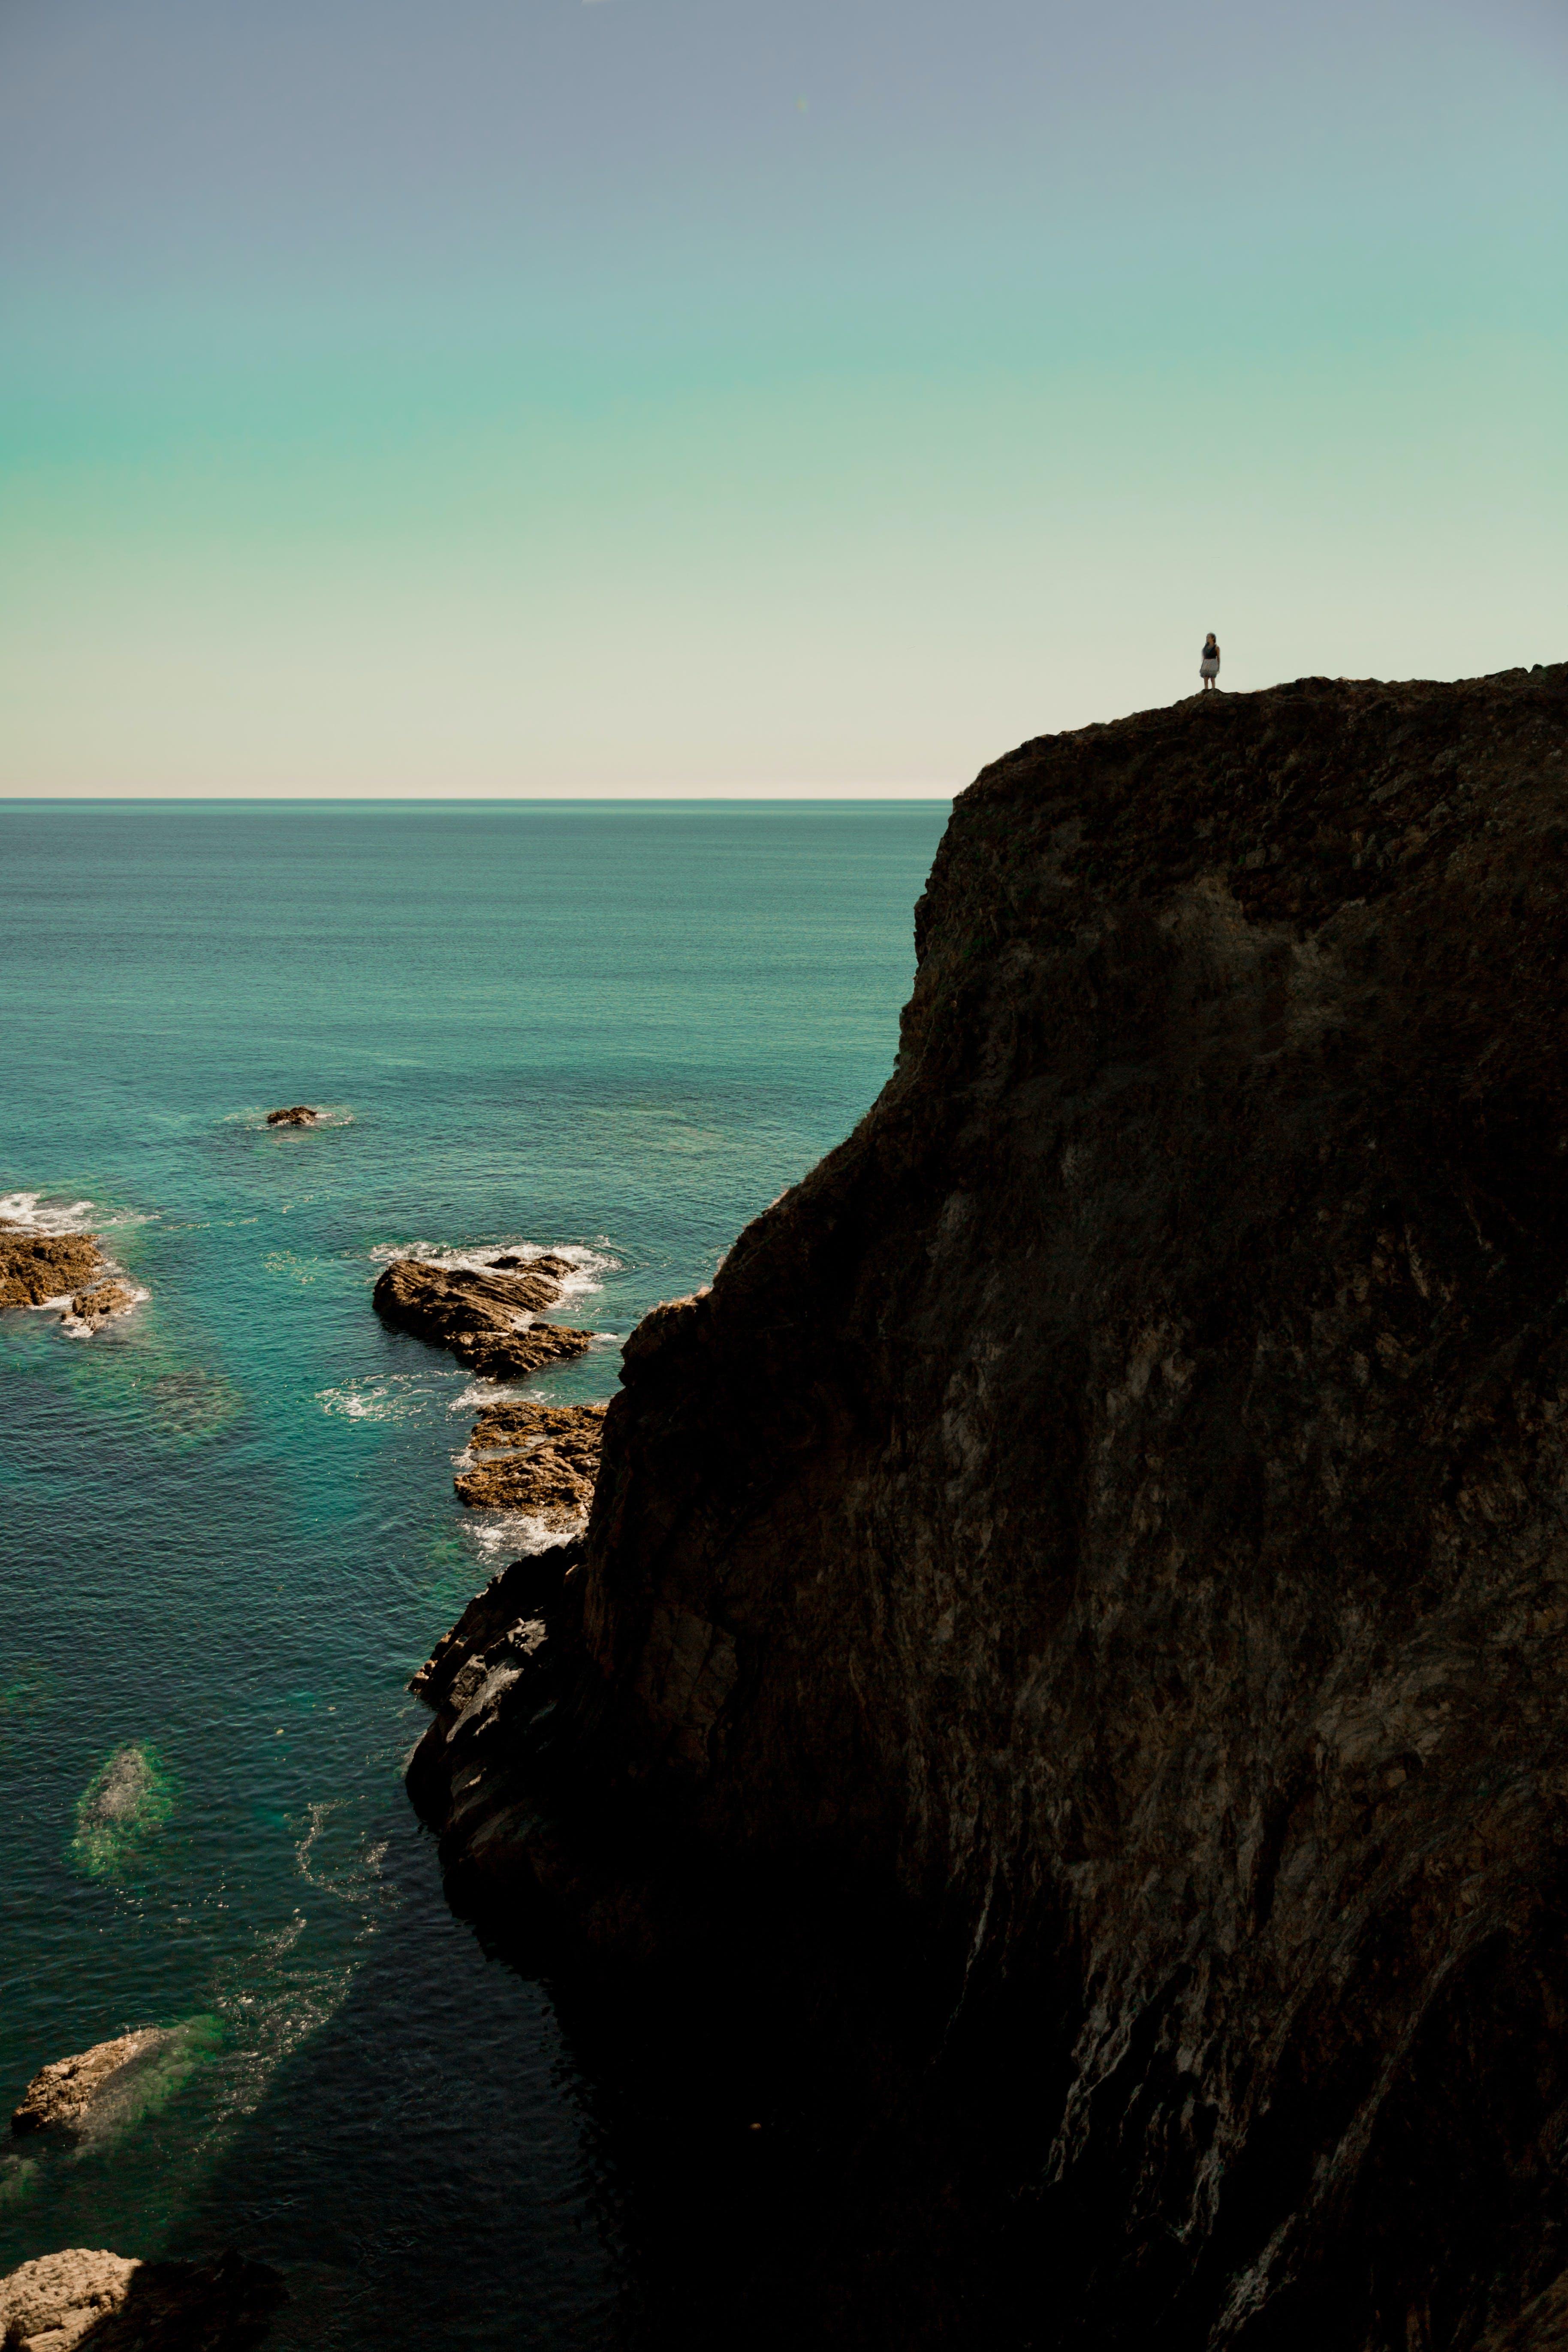 Free stock photo of cliff, overlook